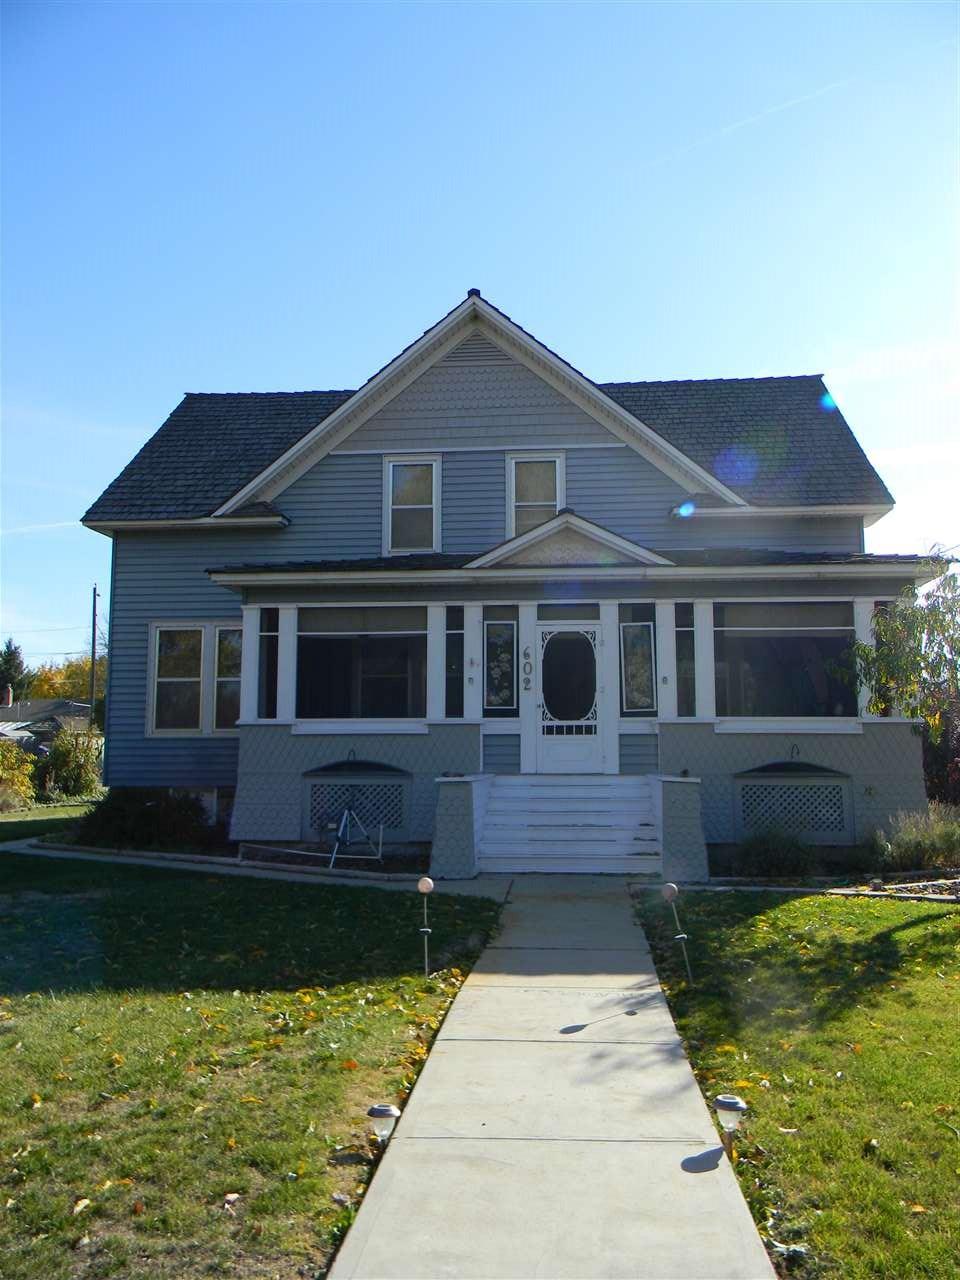 602 W 1 ST,Fruitland,Idaho 83619,4 Bedrooms Bedrooms,2 BathroomsBathrooms,Residential,602 W 1 ST,98674900